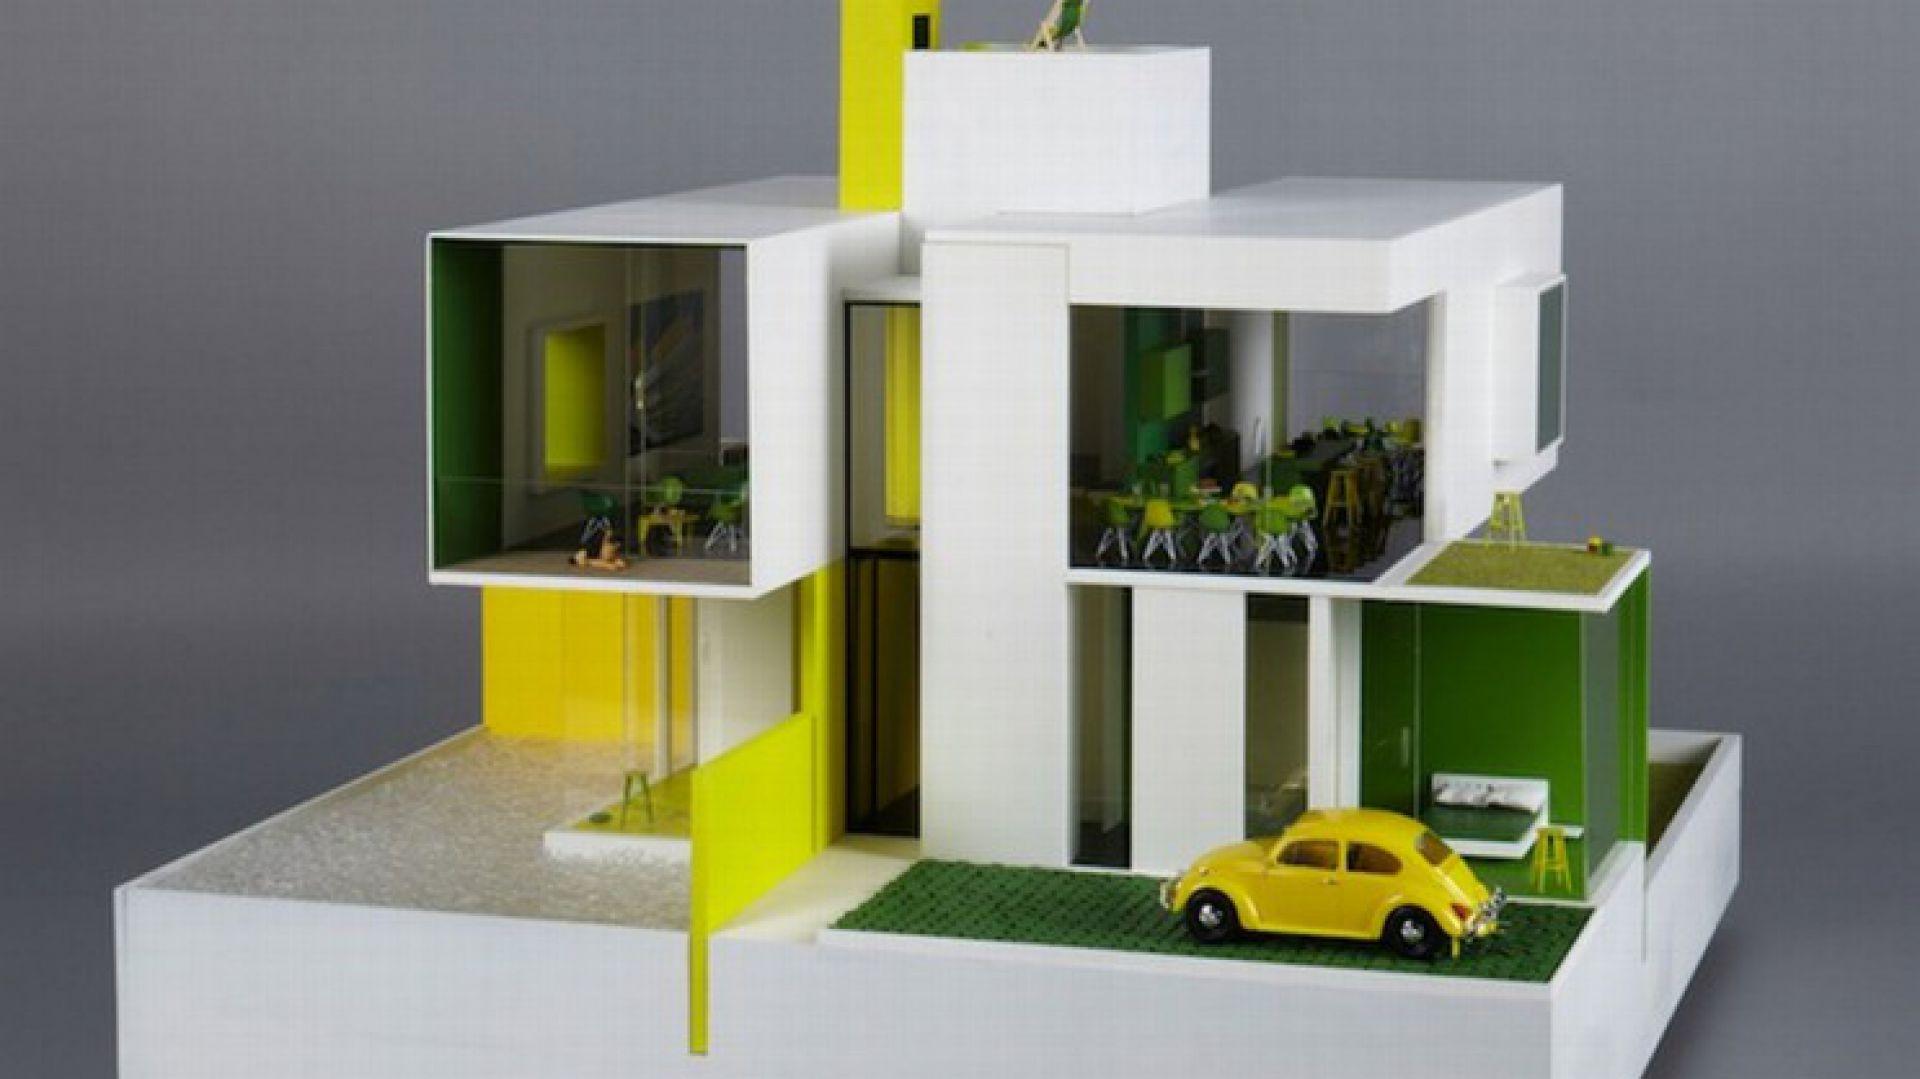 Allford Hall Monaghan Morris (AHMM) zaprojektował Dom \